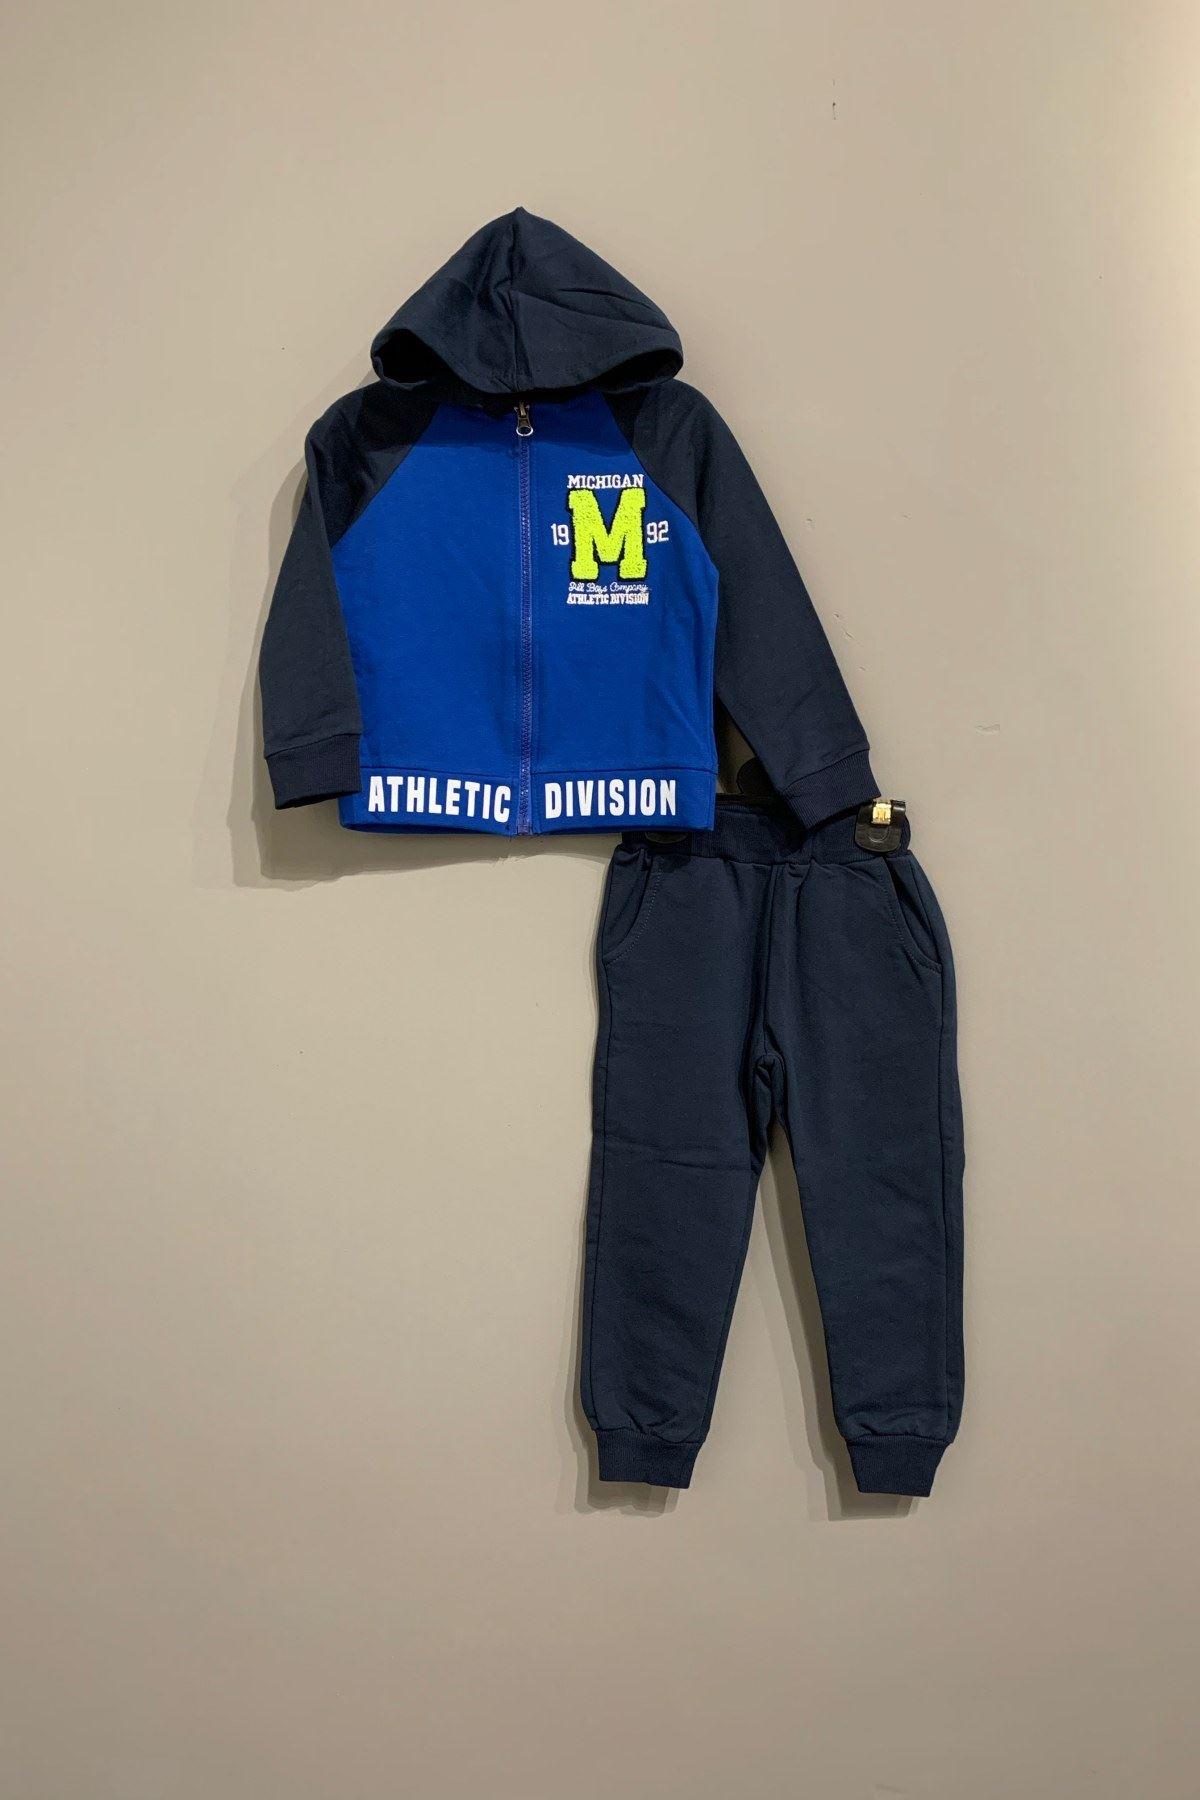 Michigan 2'Li Erkek Çocuk Takım - Mavi